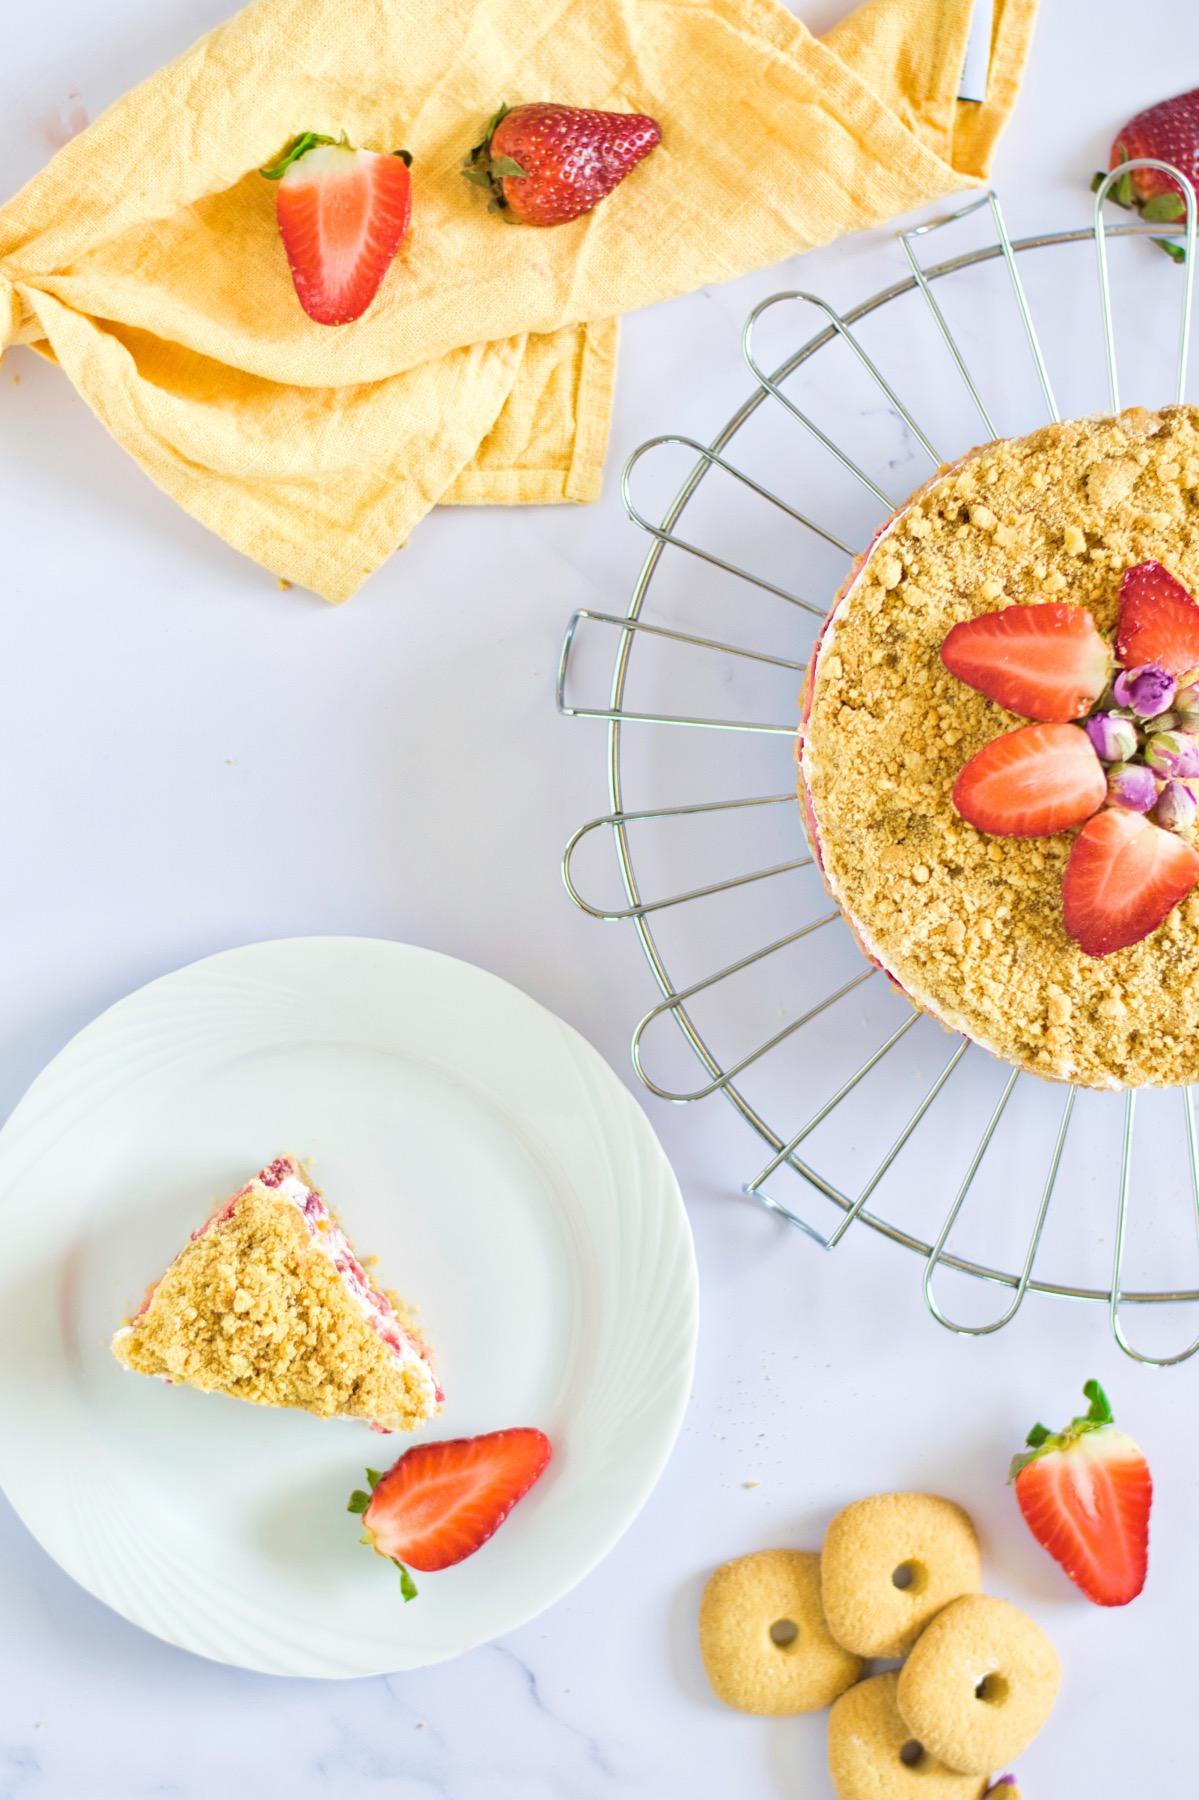 slice of strawberry crumble recipe pop shop america